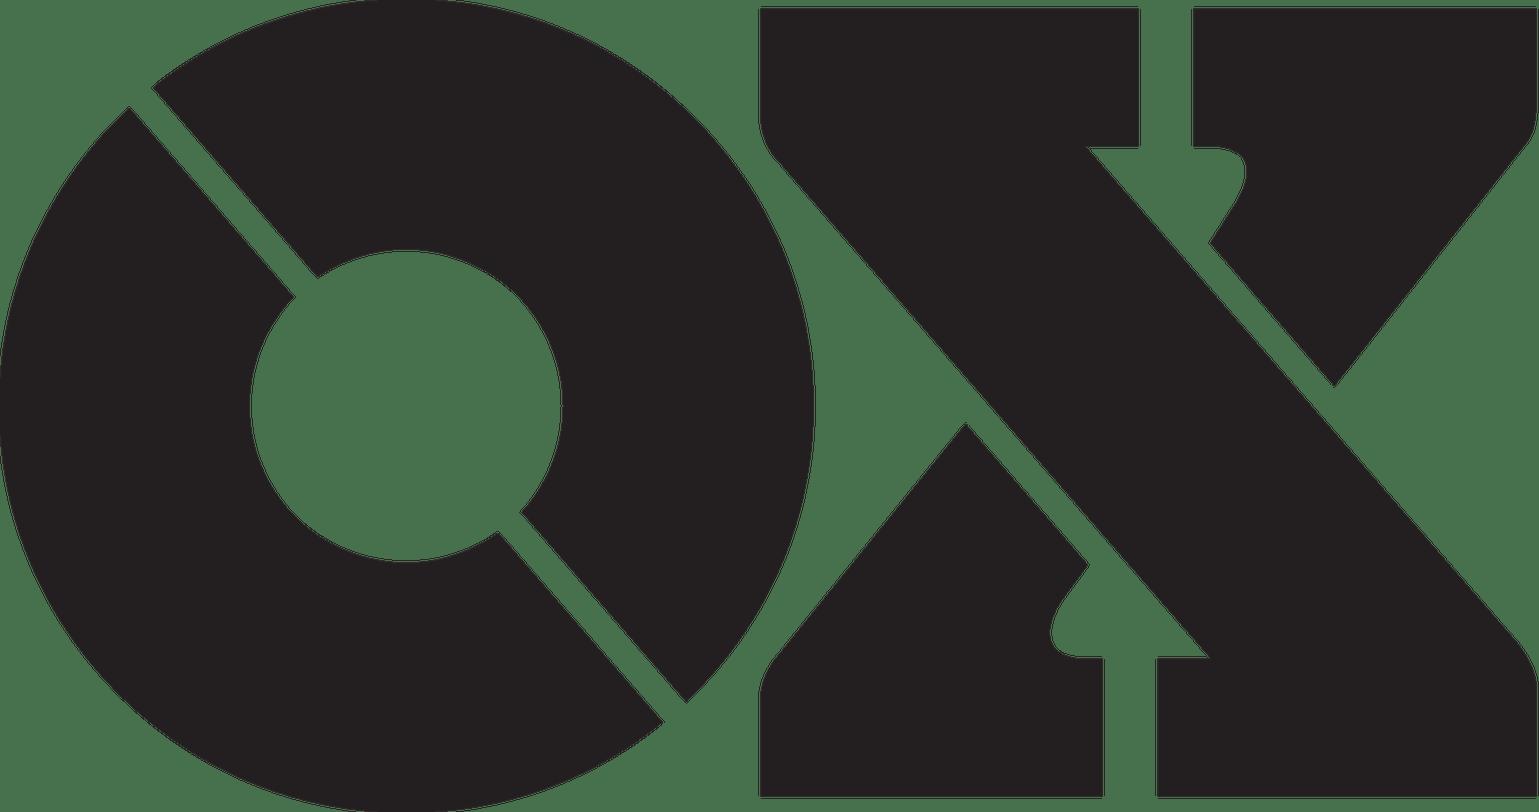 OXGVT